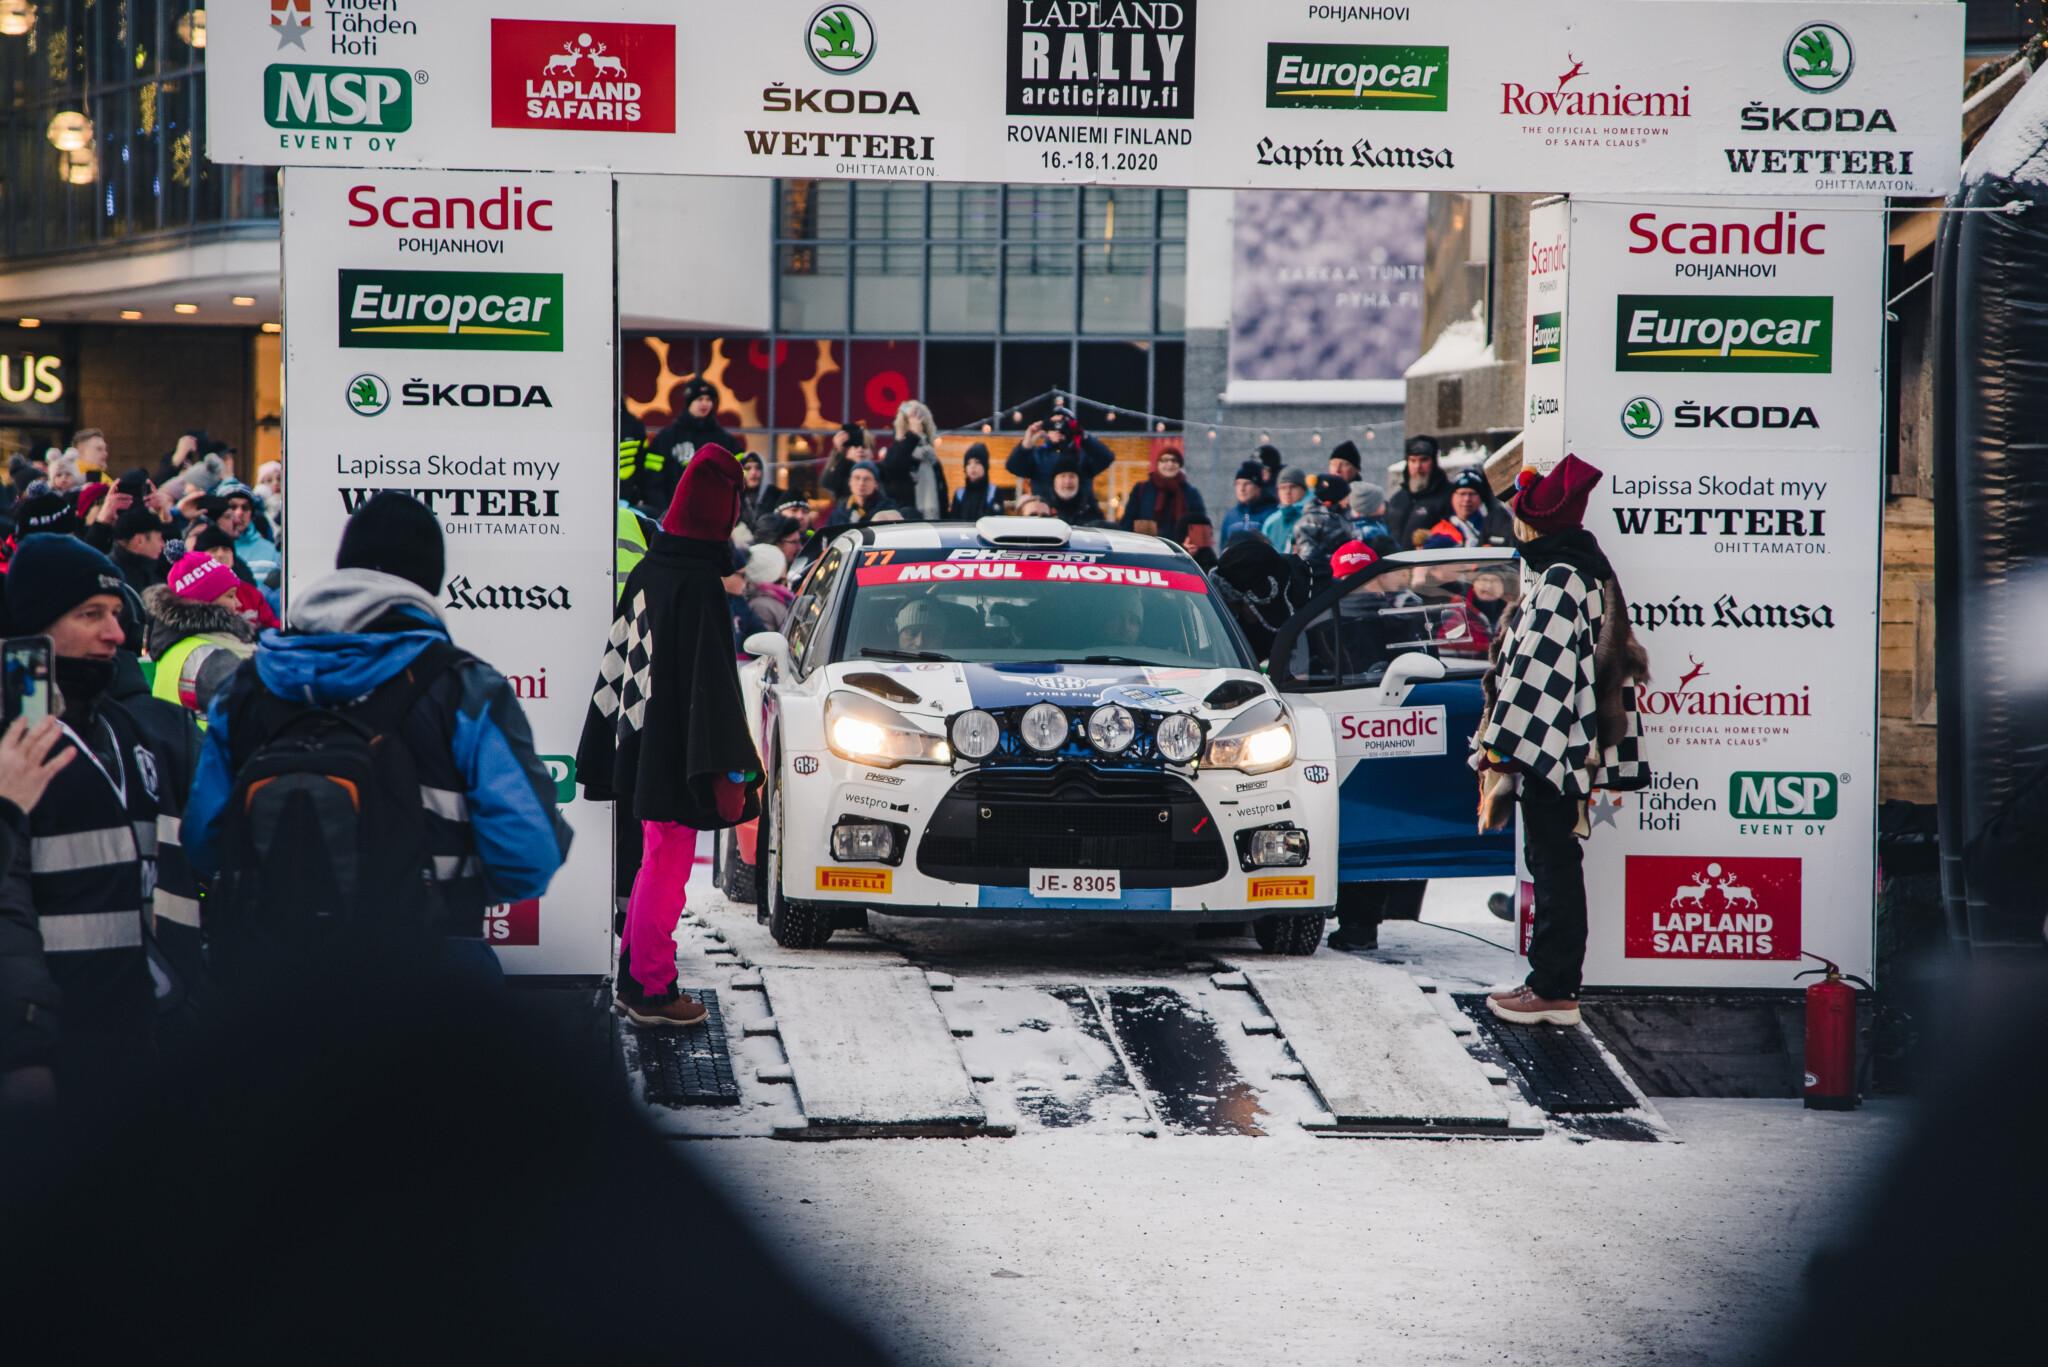 Arctic Lapland Rally 2015 in Rovaniemi Lapland Finland (27)